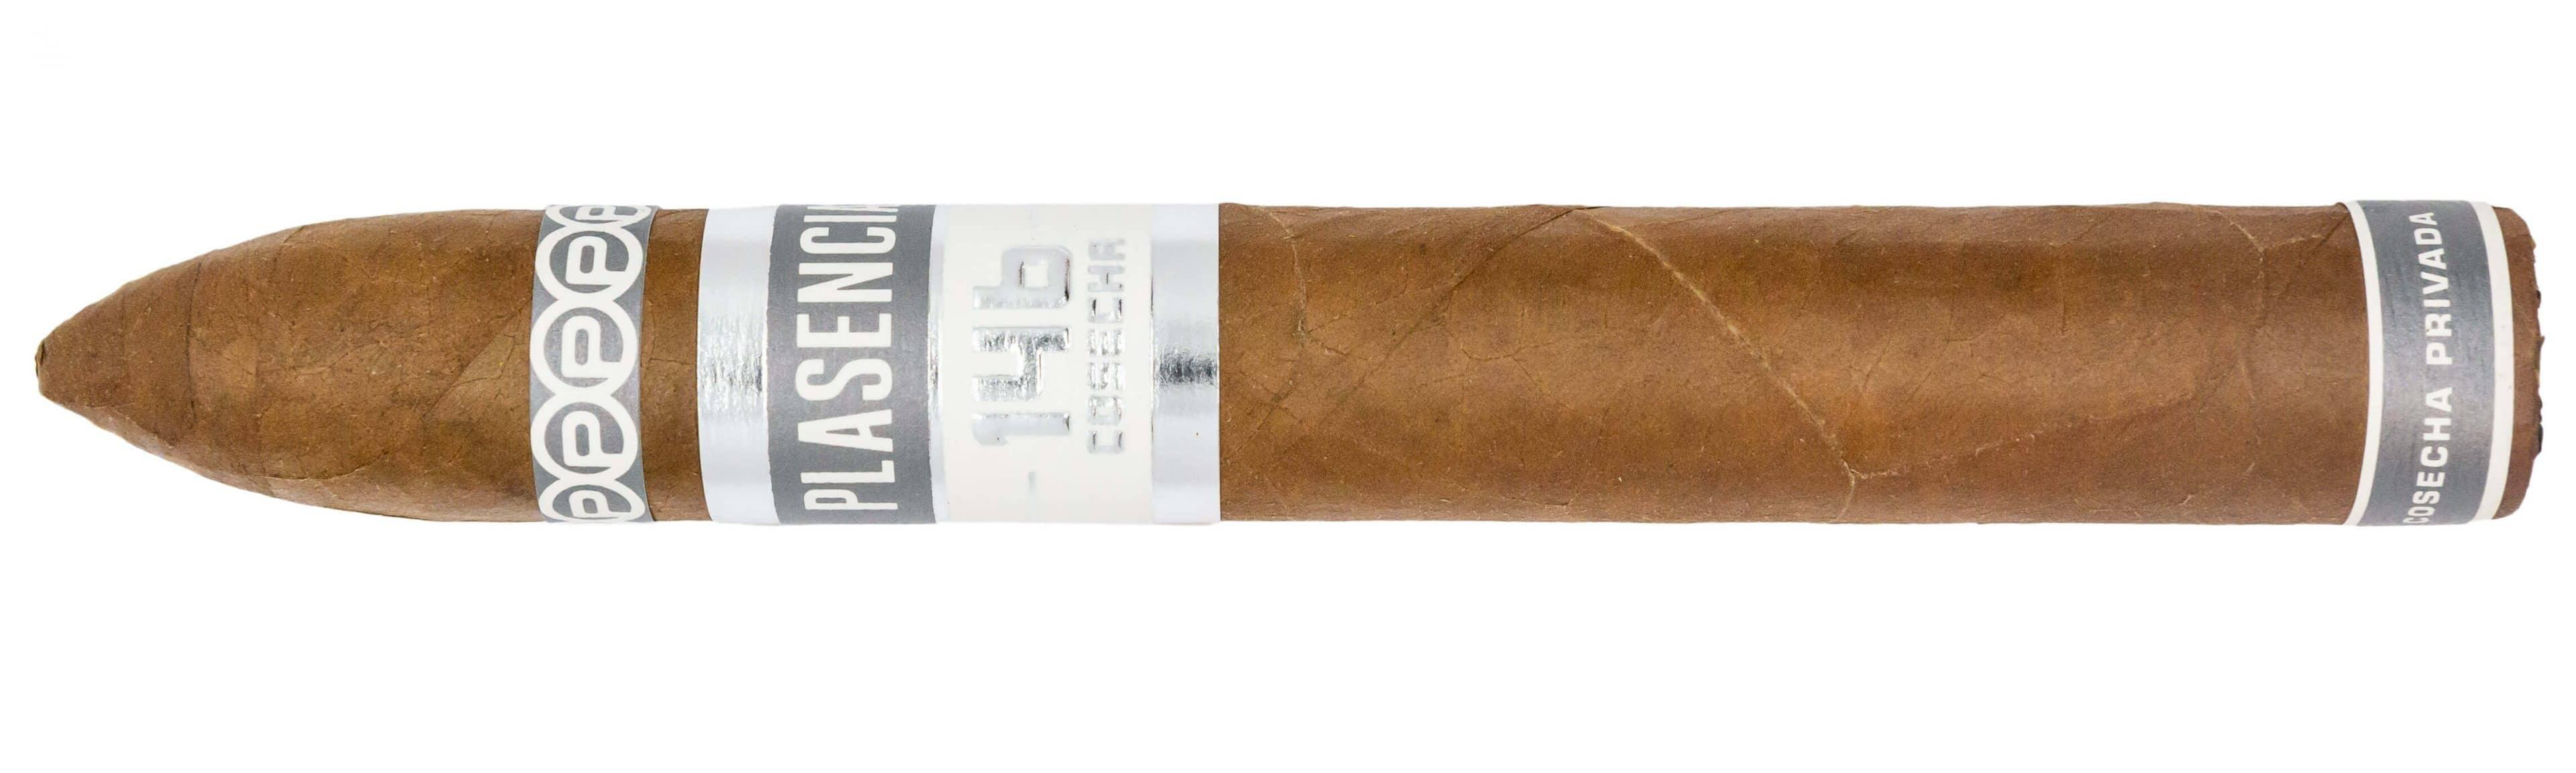 Blind Cigar Review: Plasencia   Cosecha 146 San Agustin